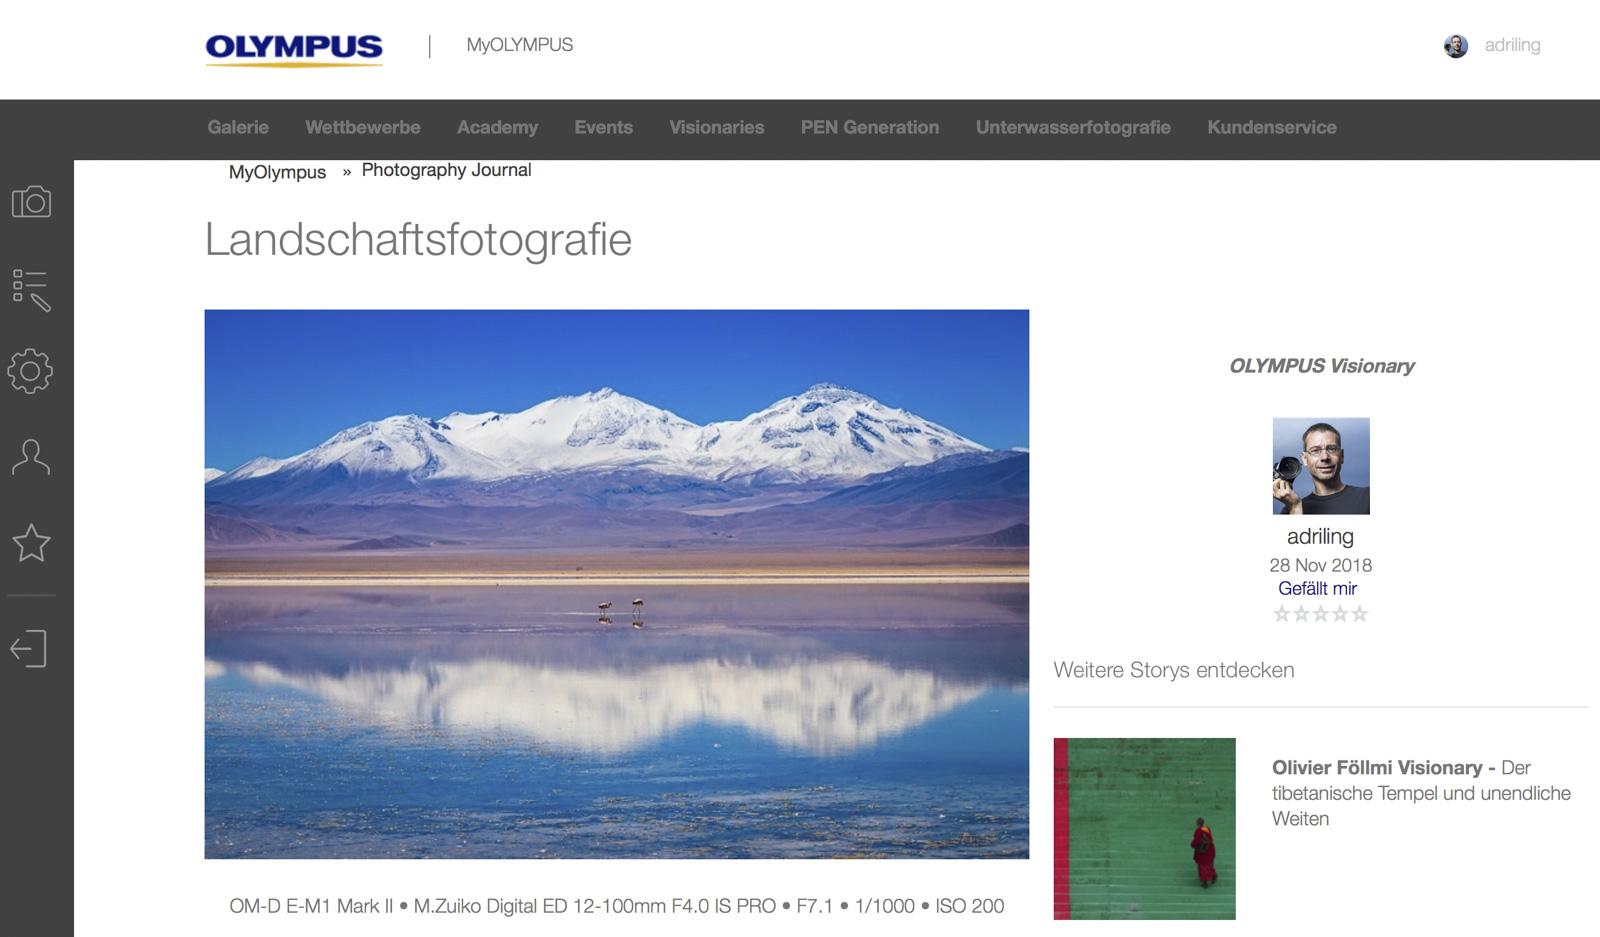 PhJ Olympus Landschaftsfotografie